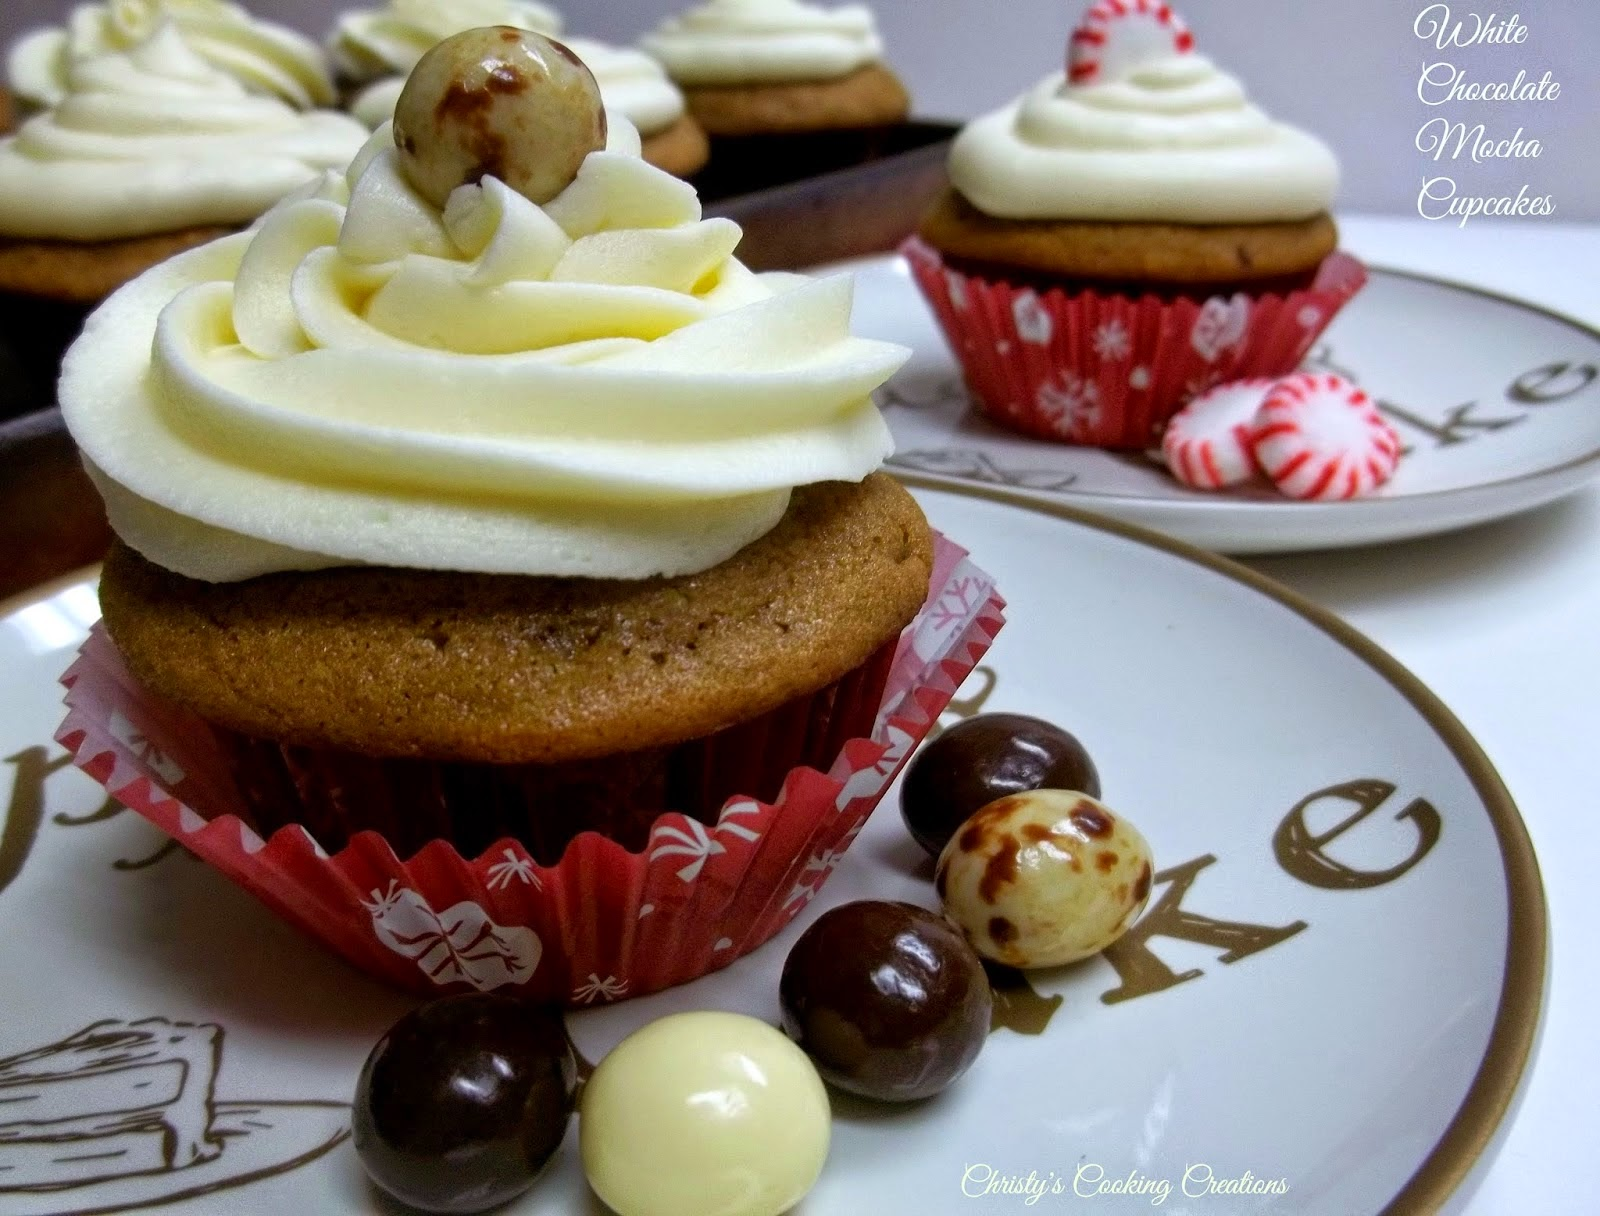 white-chocolate-mocha-cupcakes